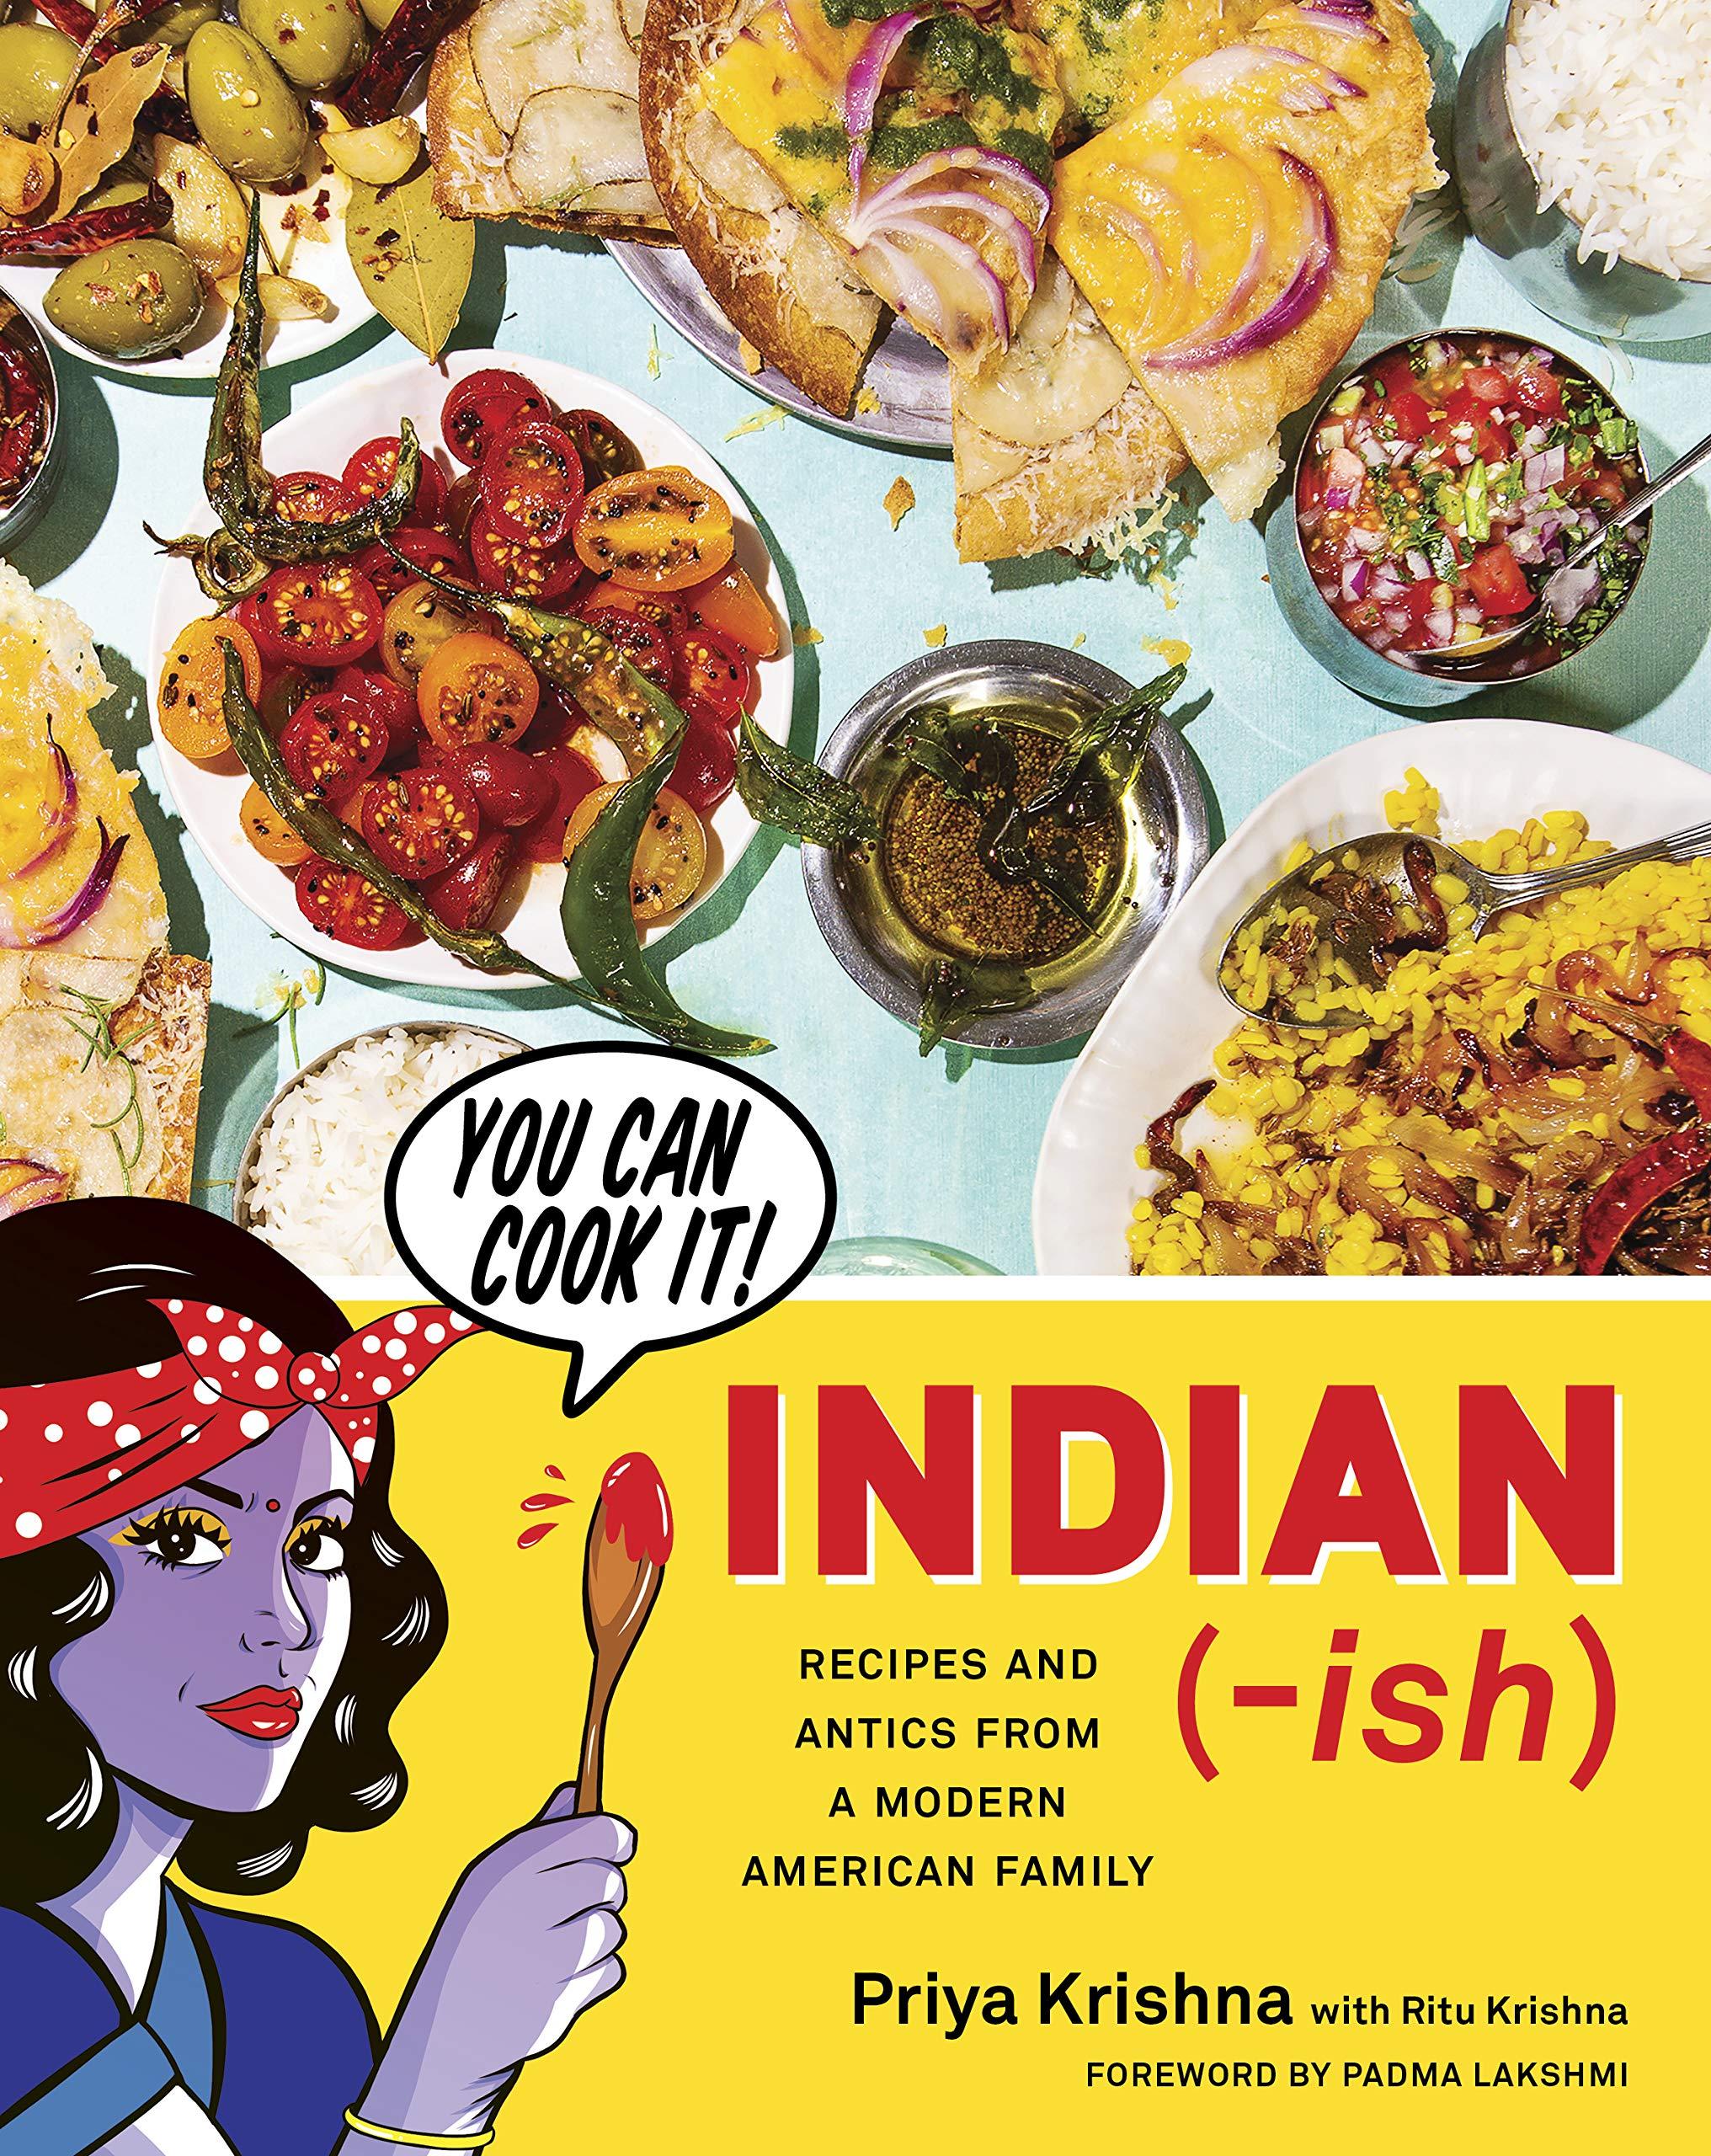 Indian ish Recipes Antics Modern American product image